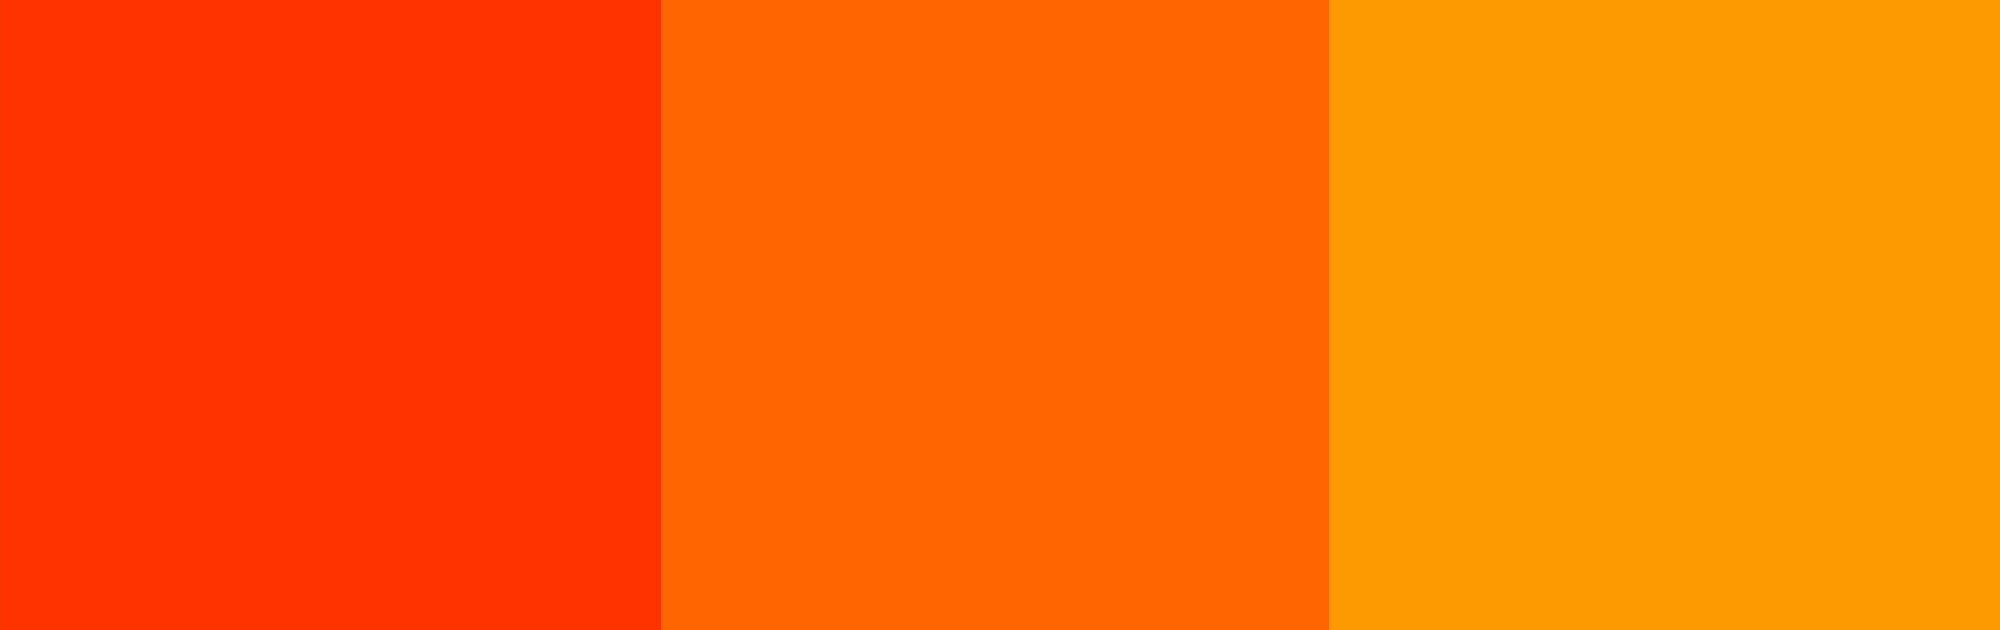 Three analogous warm colors.